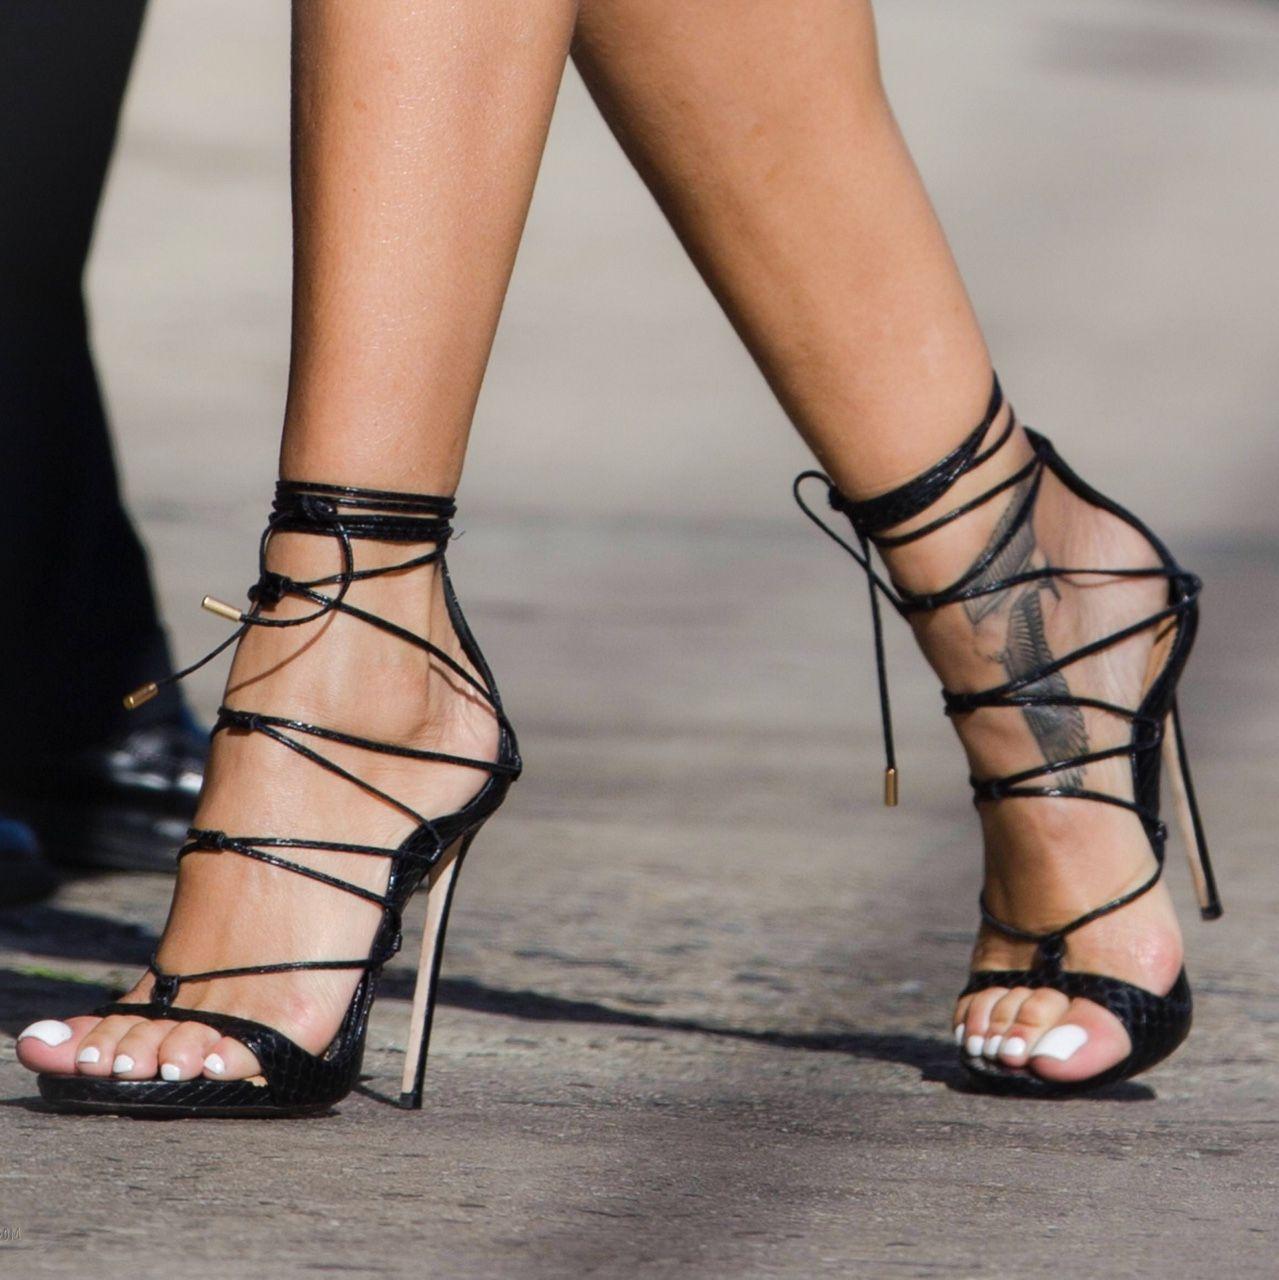 sexy #heel #shoes   Beauty & Fashion   Pinterest